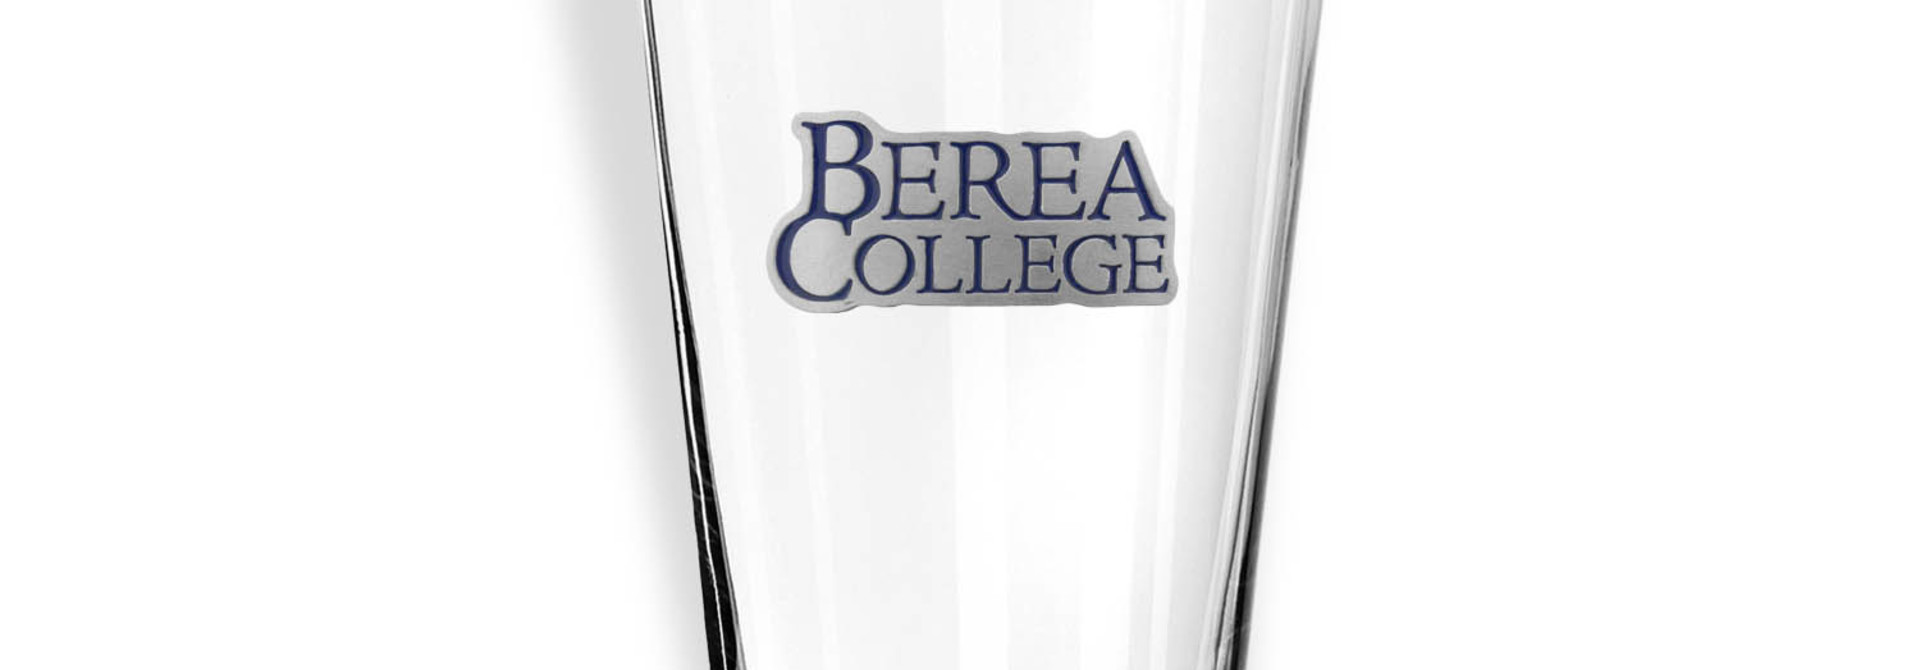 Berea College Mixing Glass